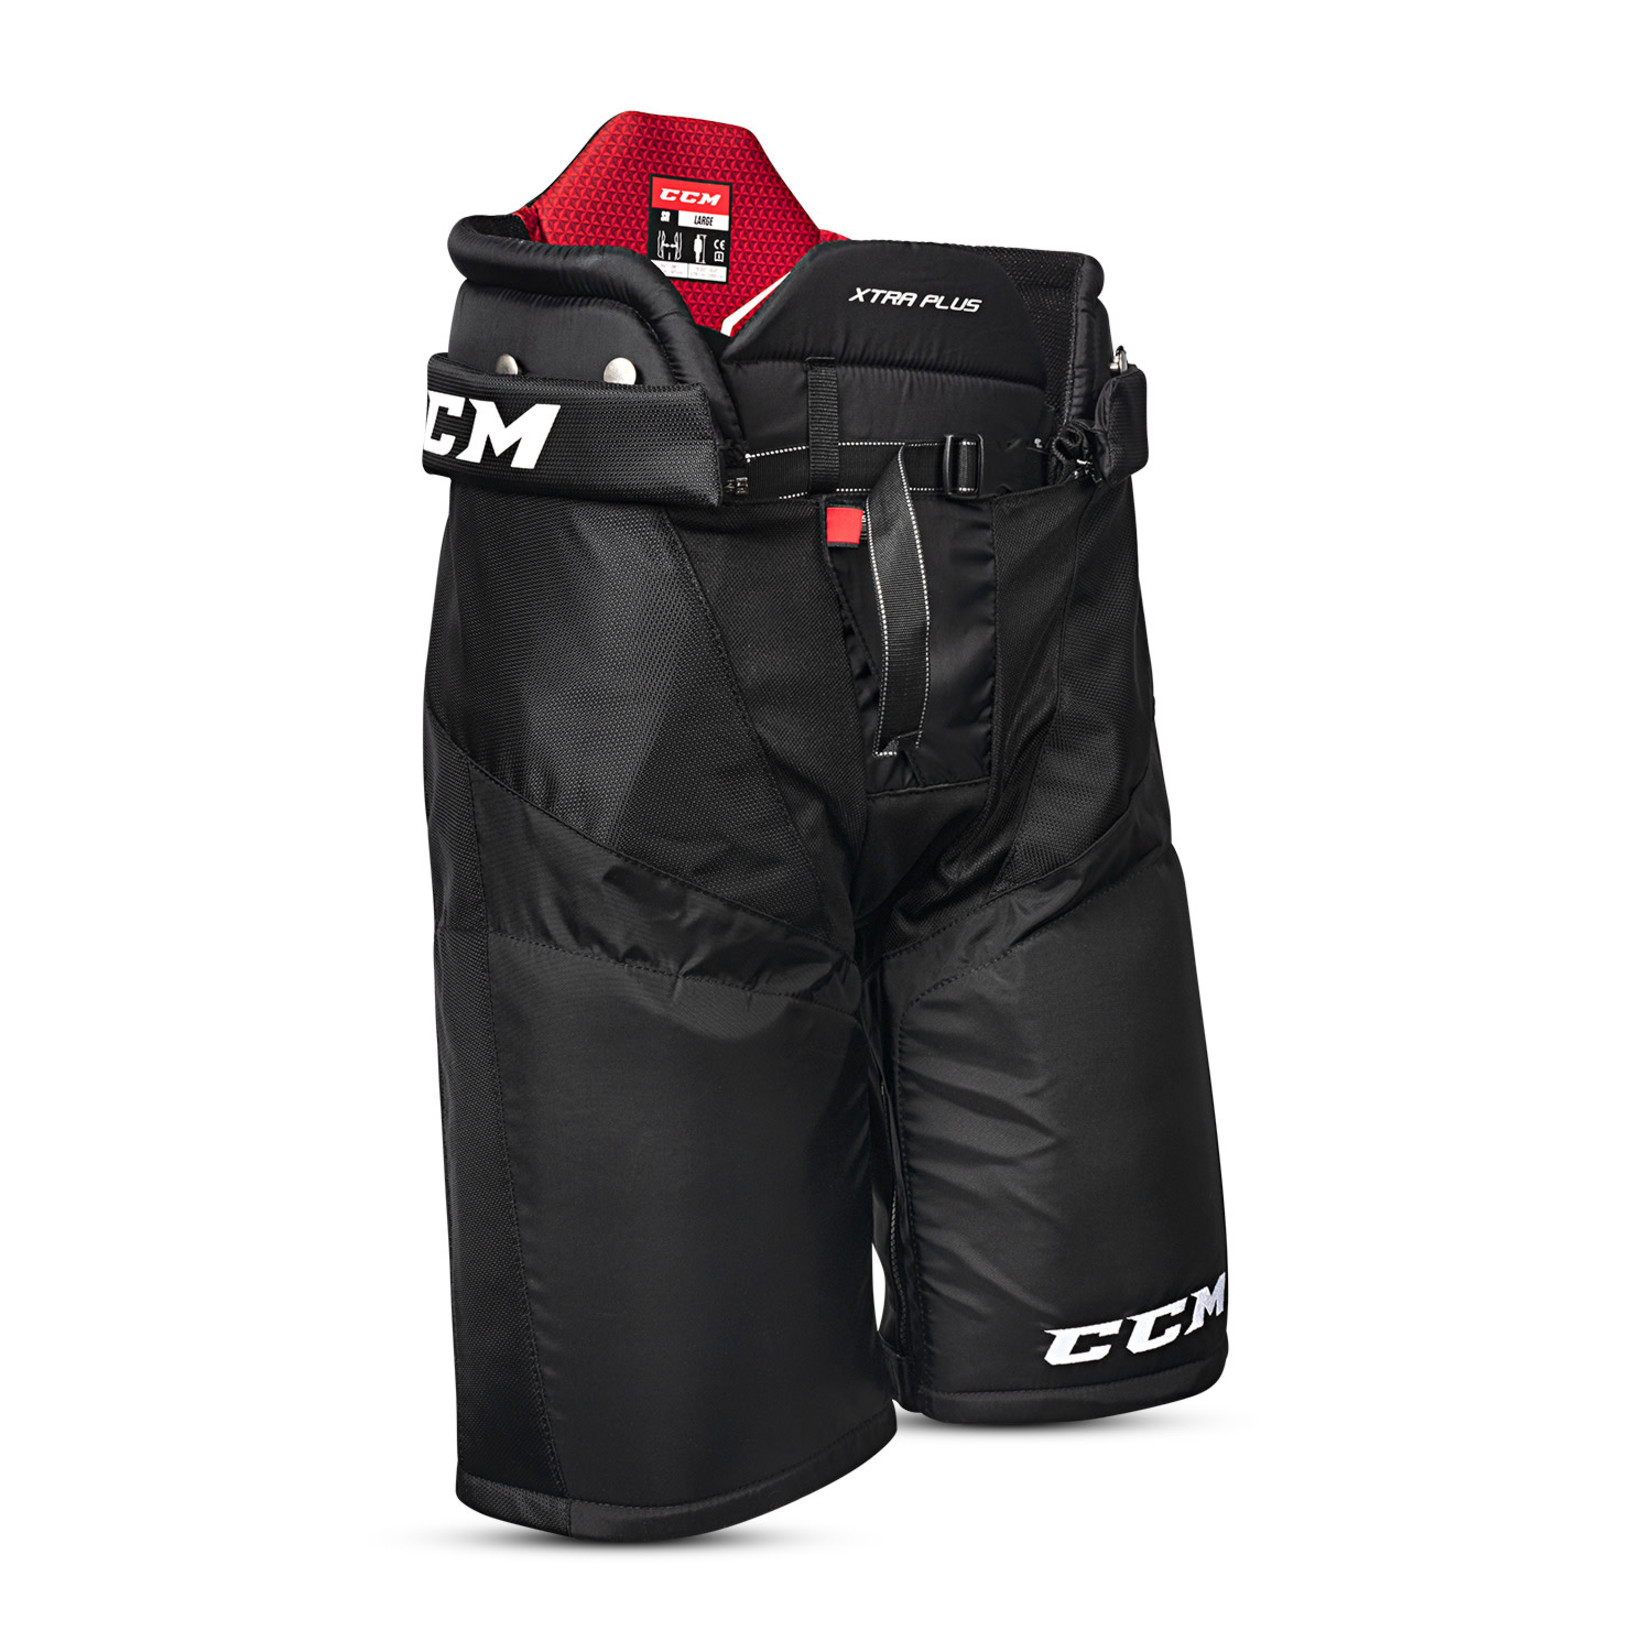 CCM CCM Hockey Pants, Jetspeed Xtra Plus, Senior